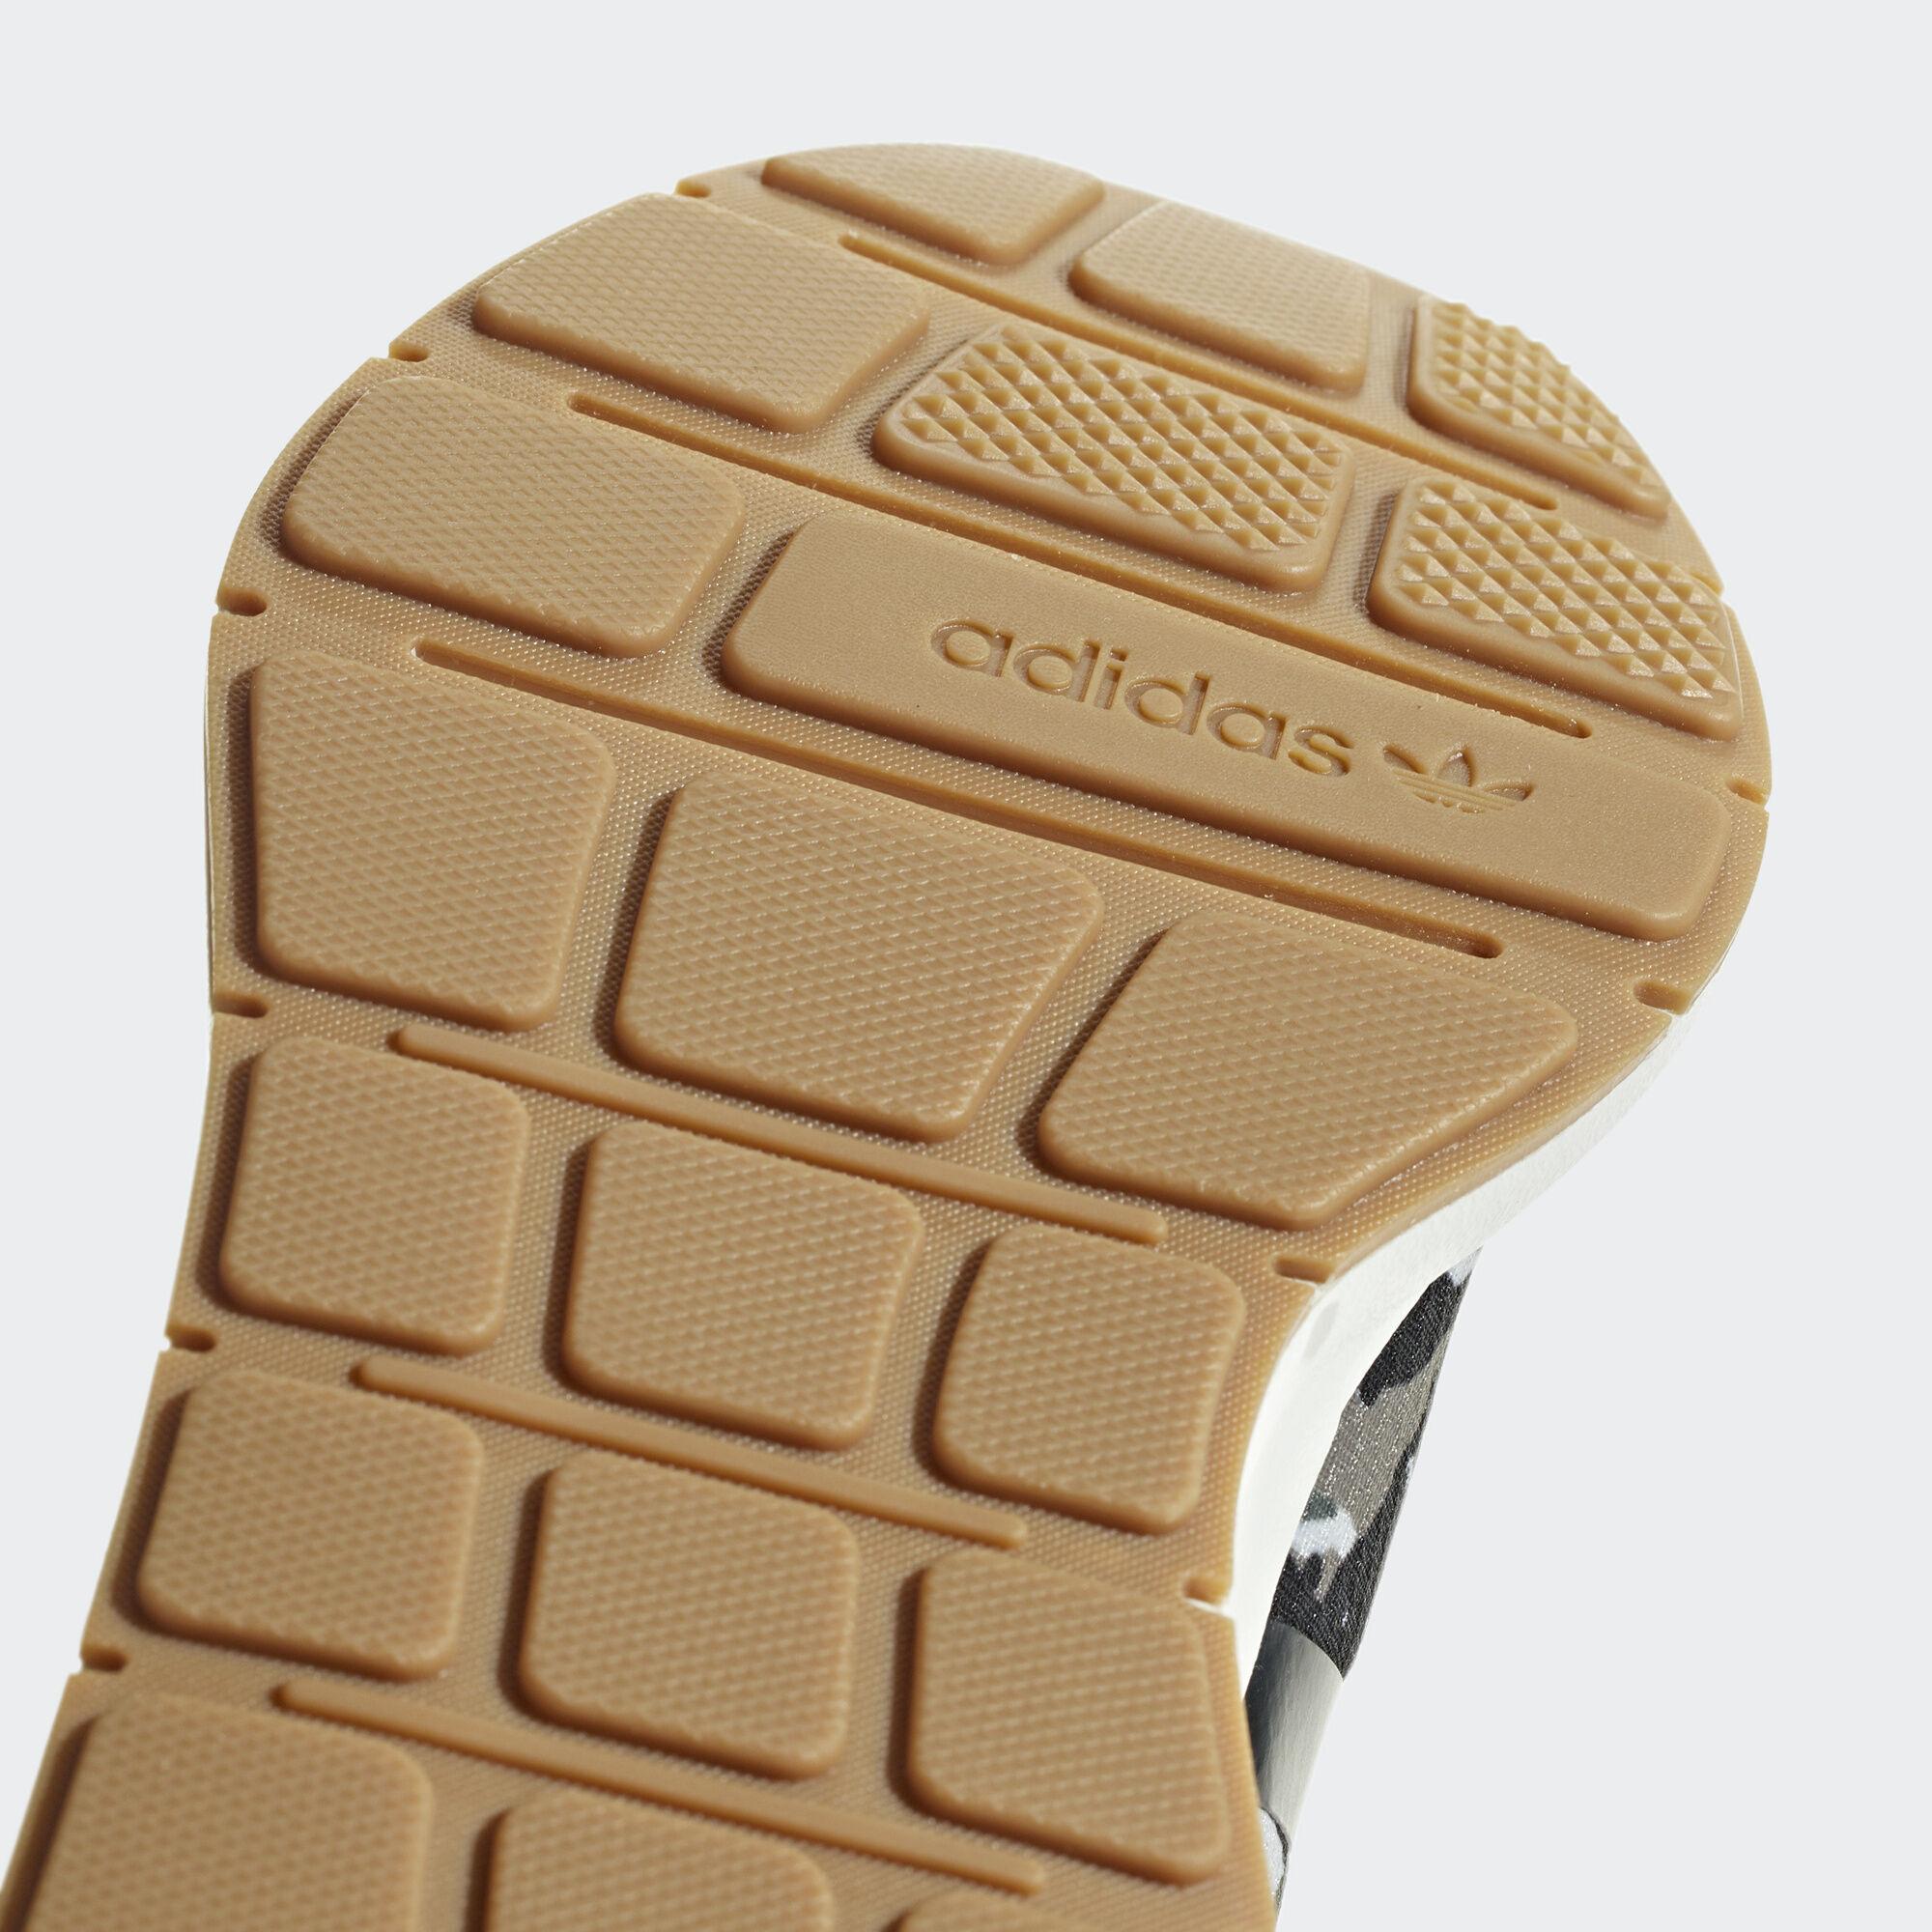 c2b3ebf308303 adidas Swift Run Barrier Shoes - Green